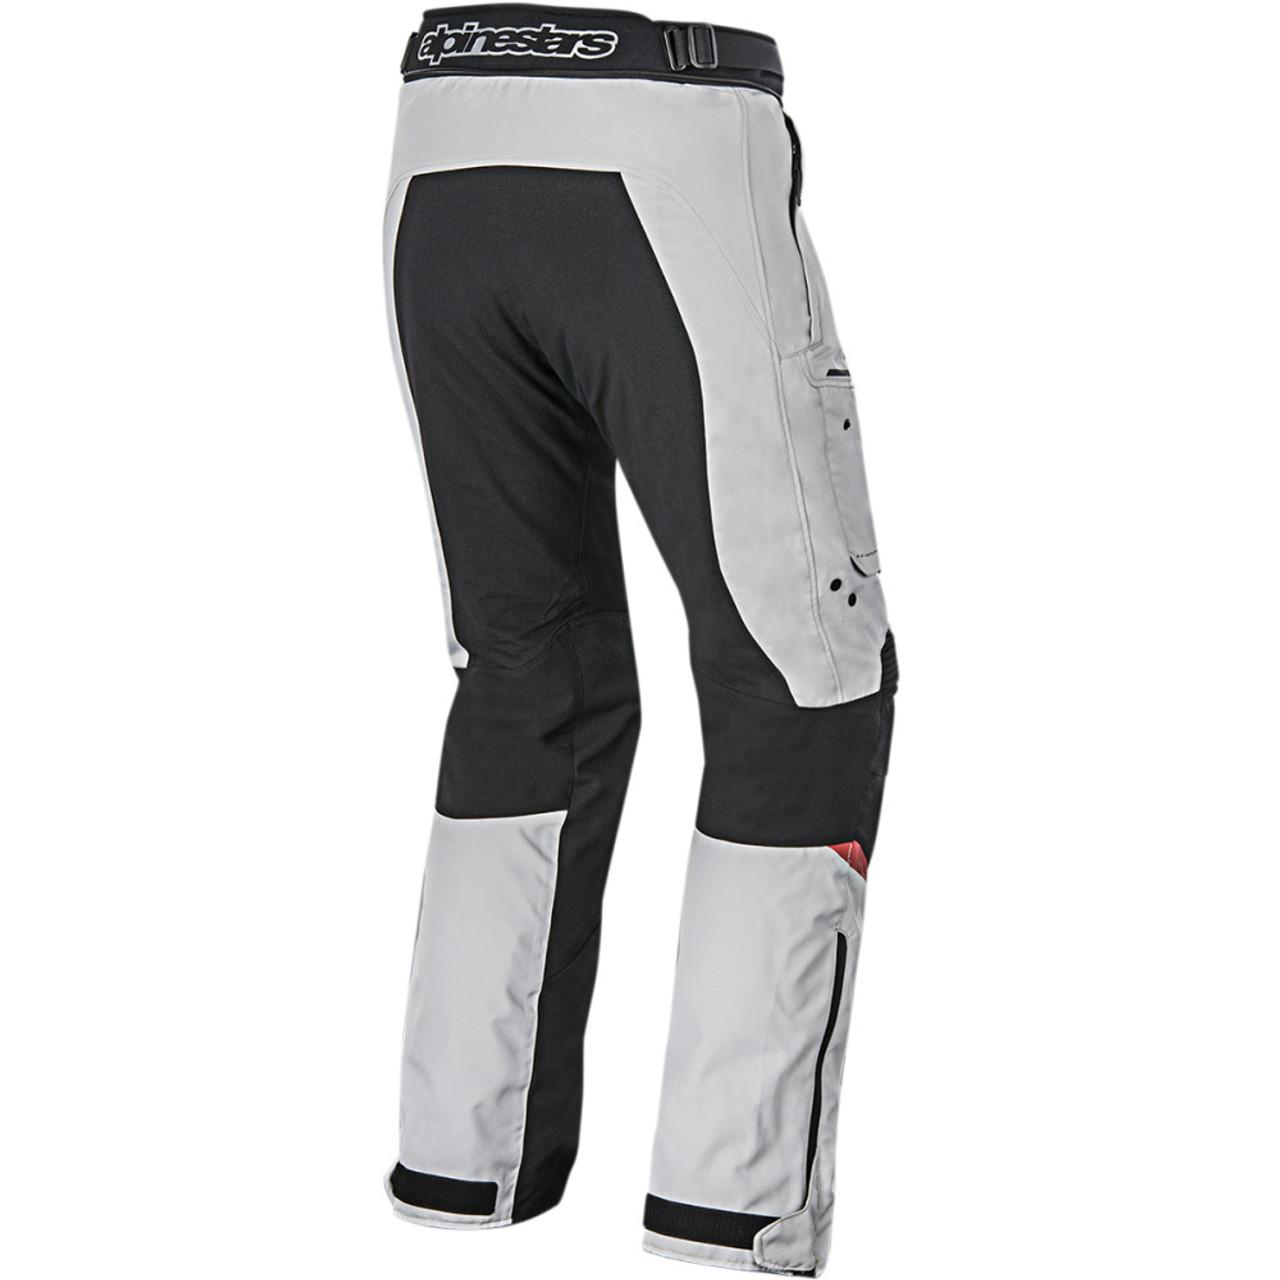 Alpinestars Motorcycle Jeans-Valparaiso 2 Drystar Size M Black